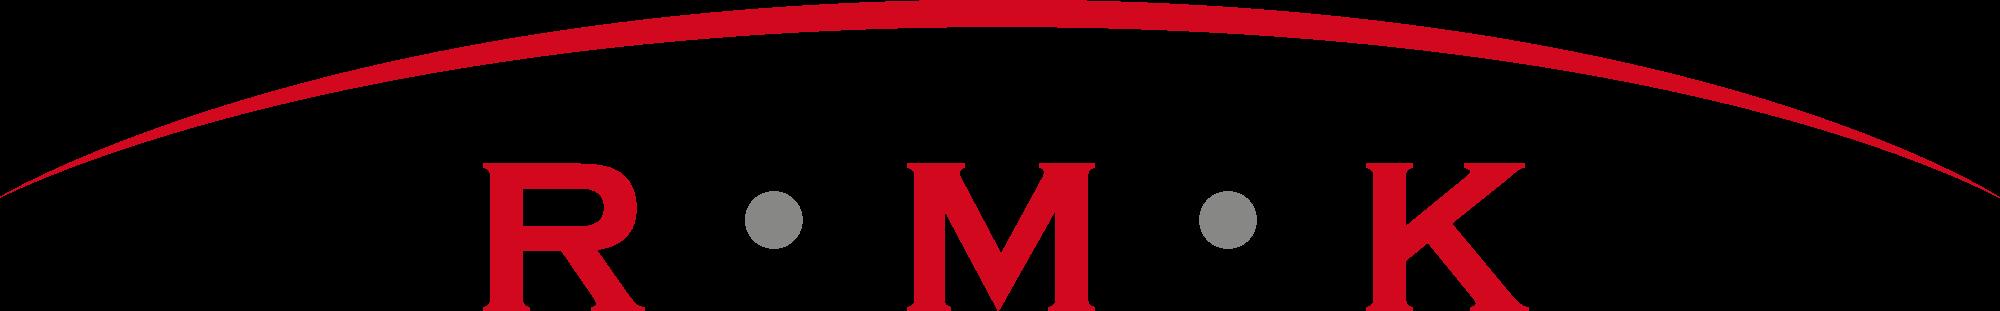 Logo RMK - Radloff, Meier & Kollegen